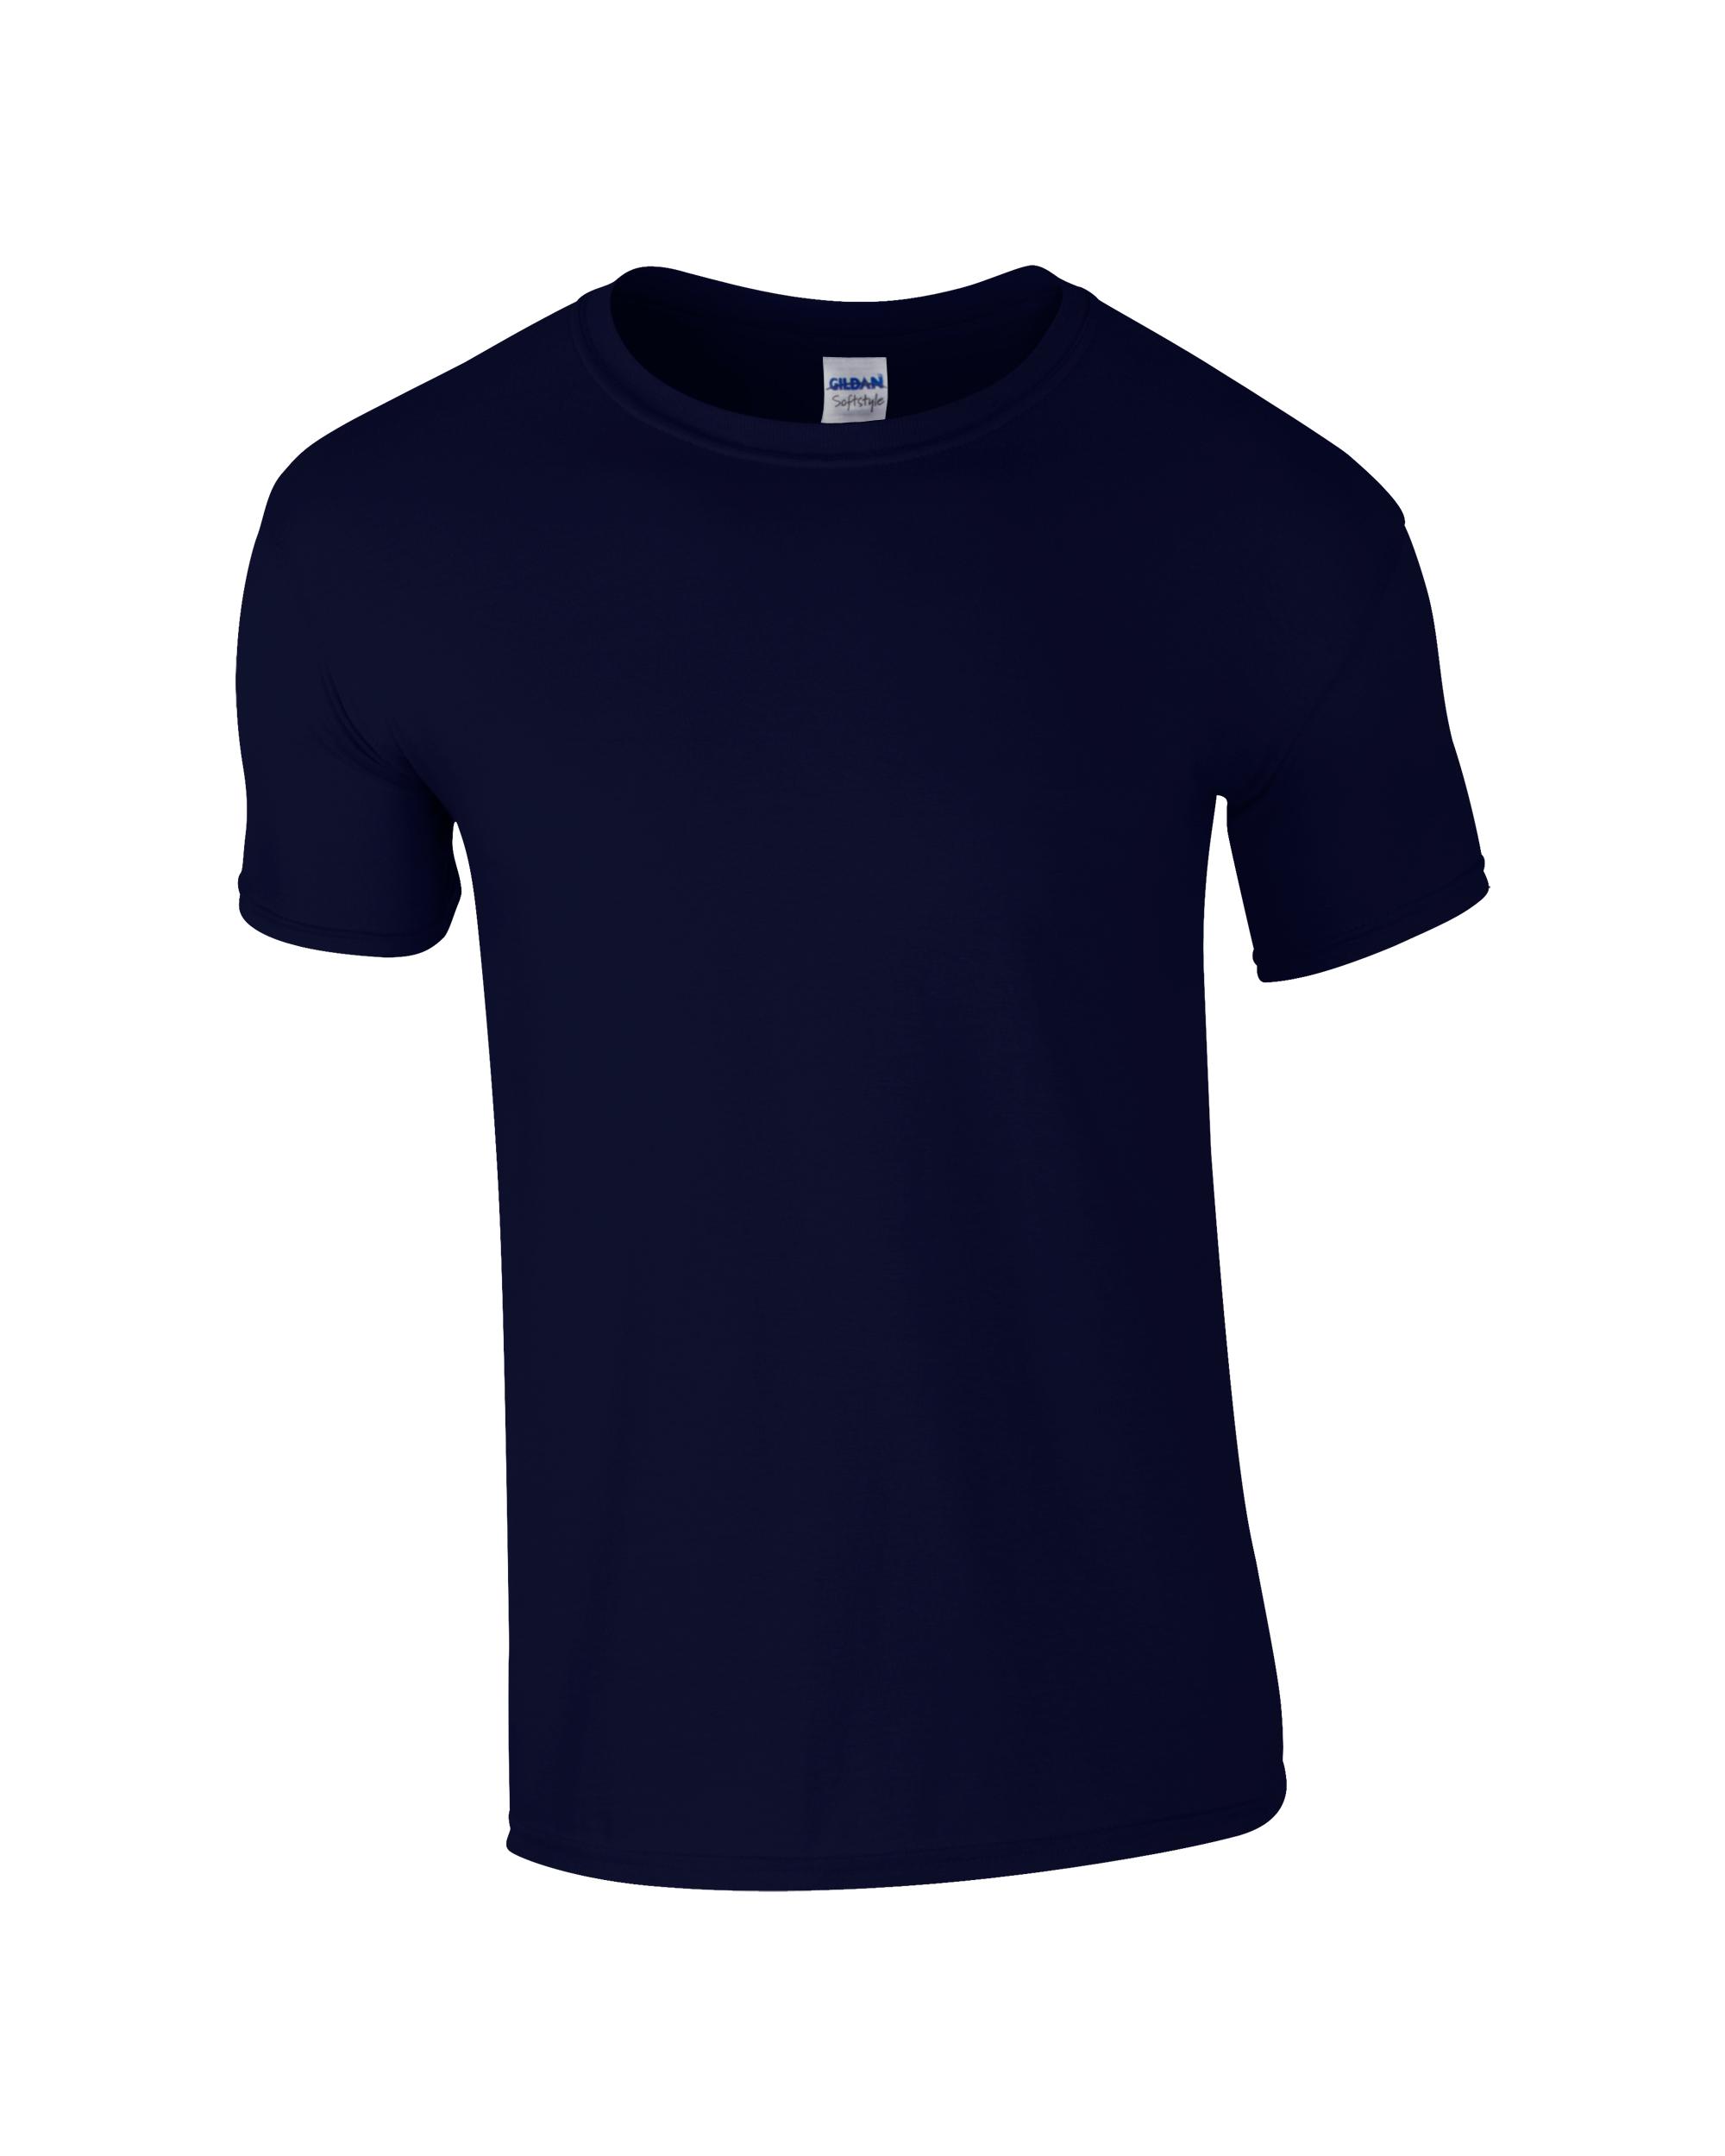 Muška T-shirt majica kratki rukav plava